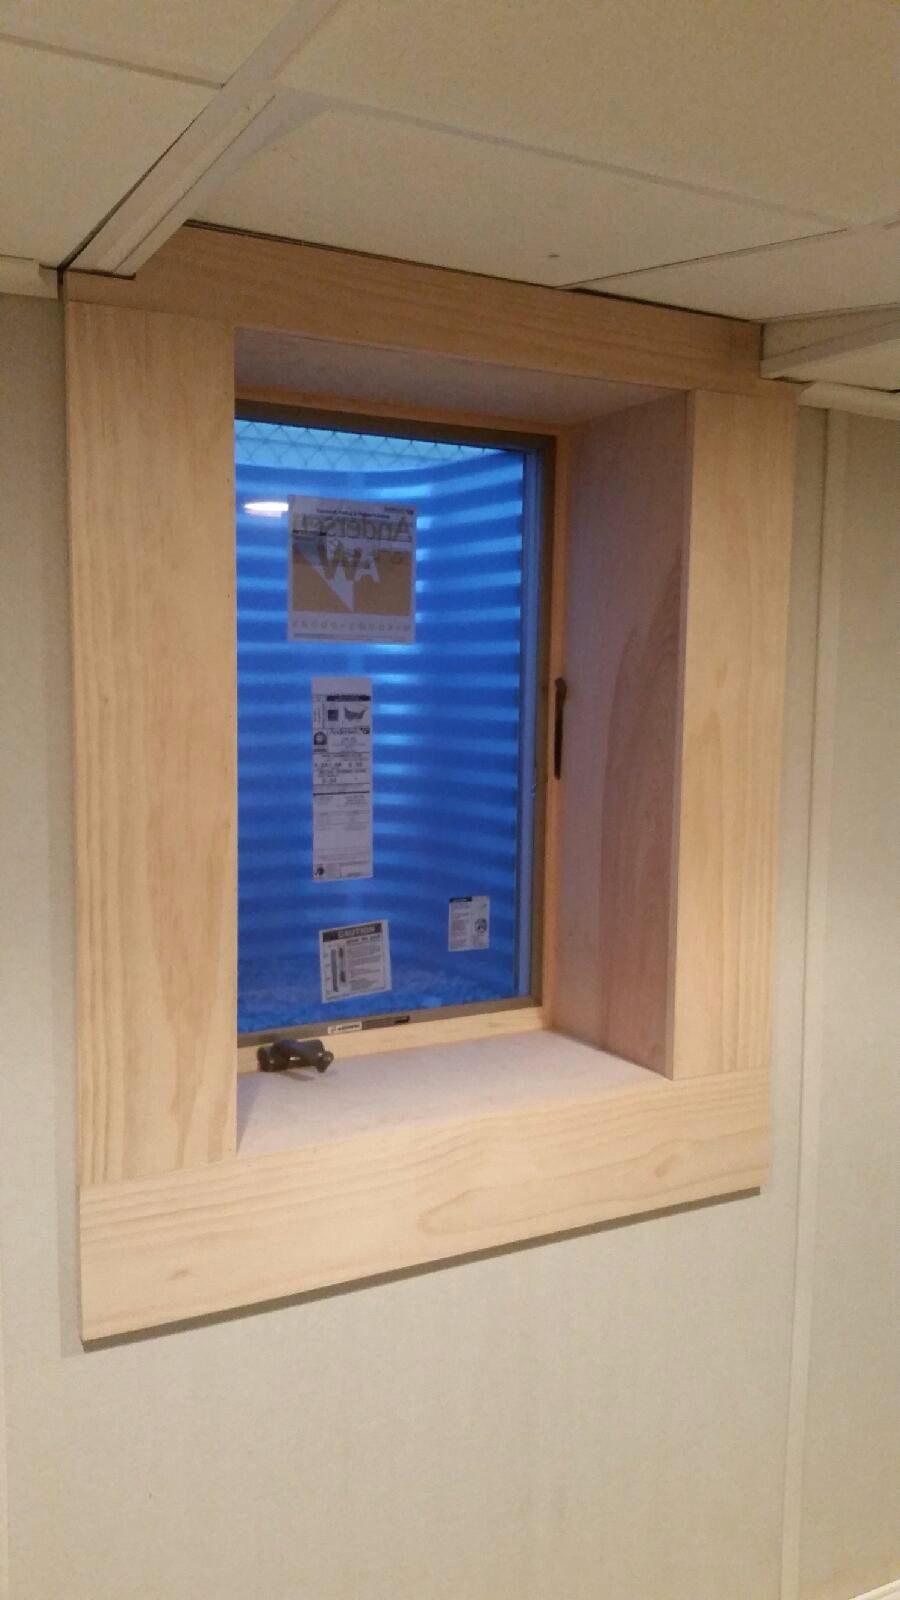 Affordable Egress Windows And Basement Waterproofing Llc 763 267 3891 Waterproofing Basement Egress Window Basement Remodeling